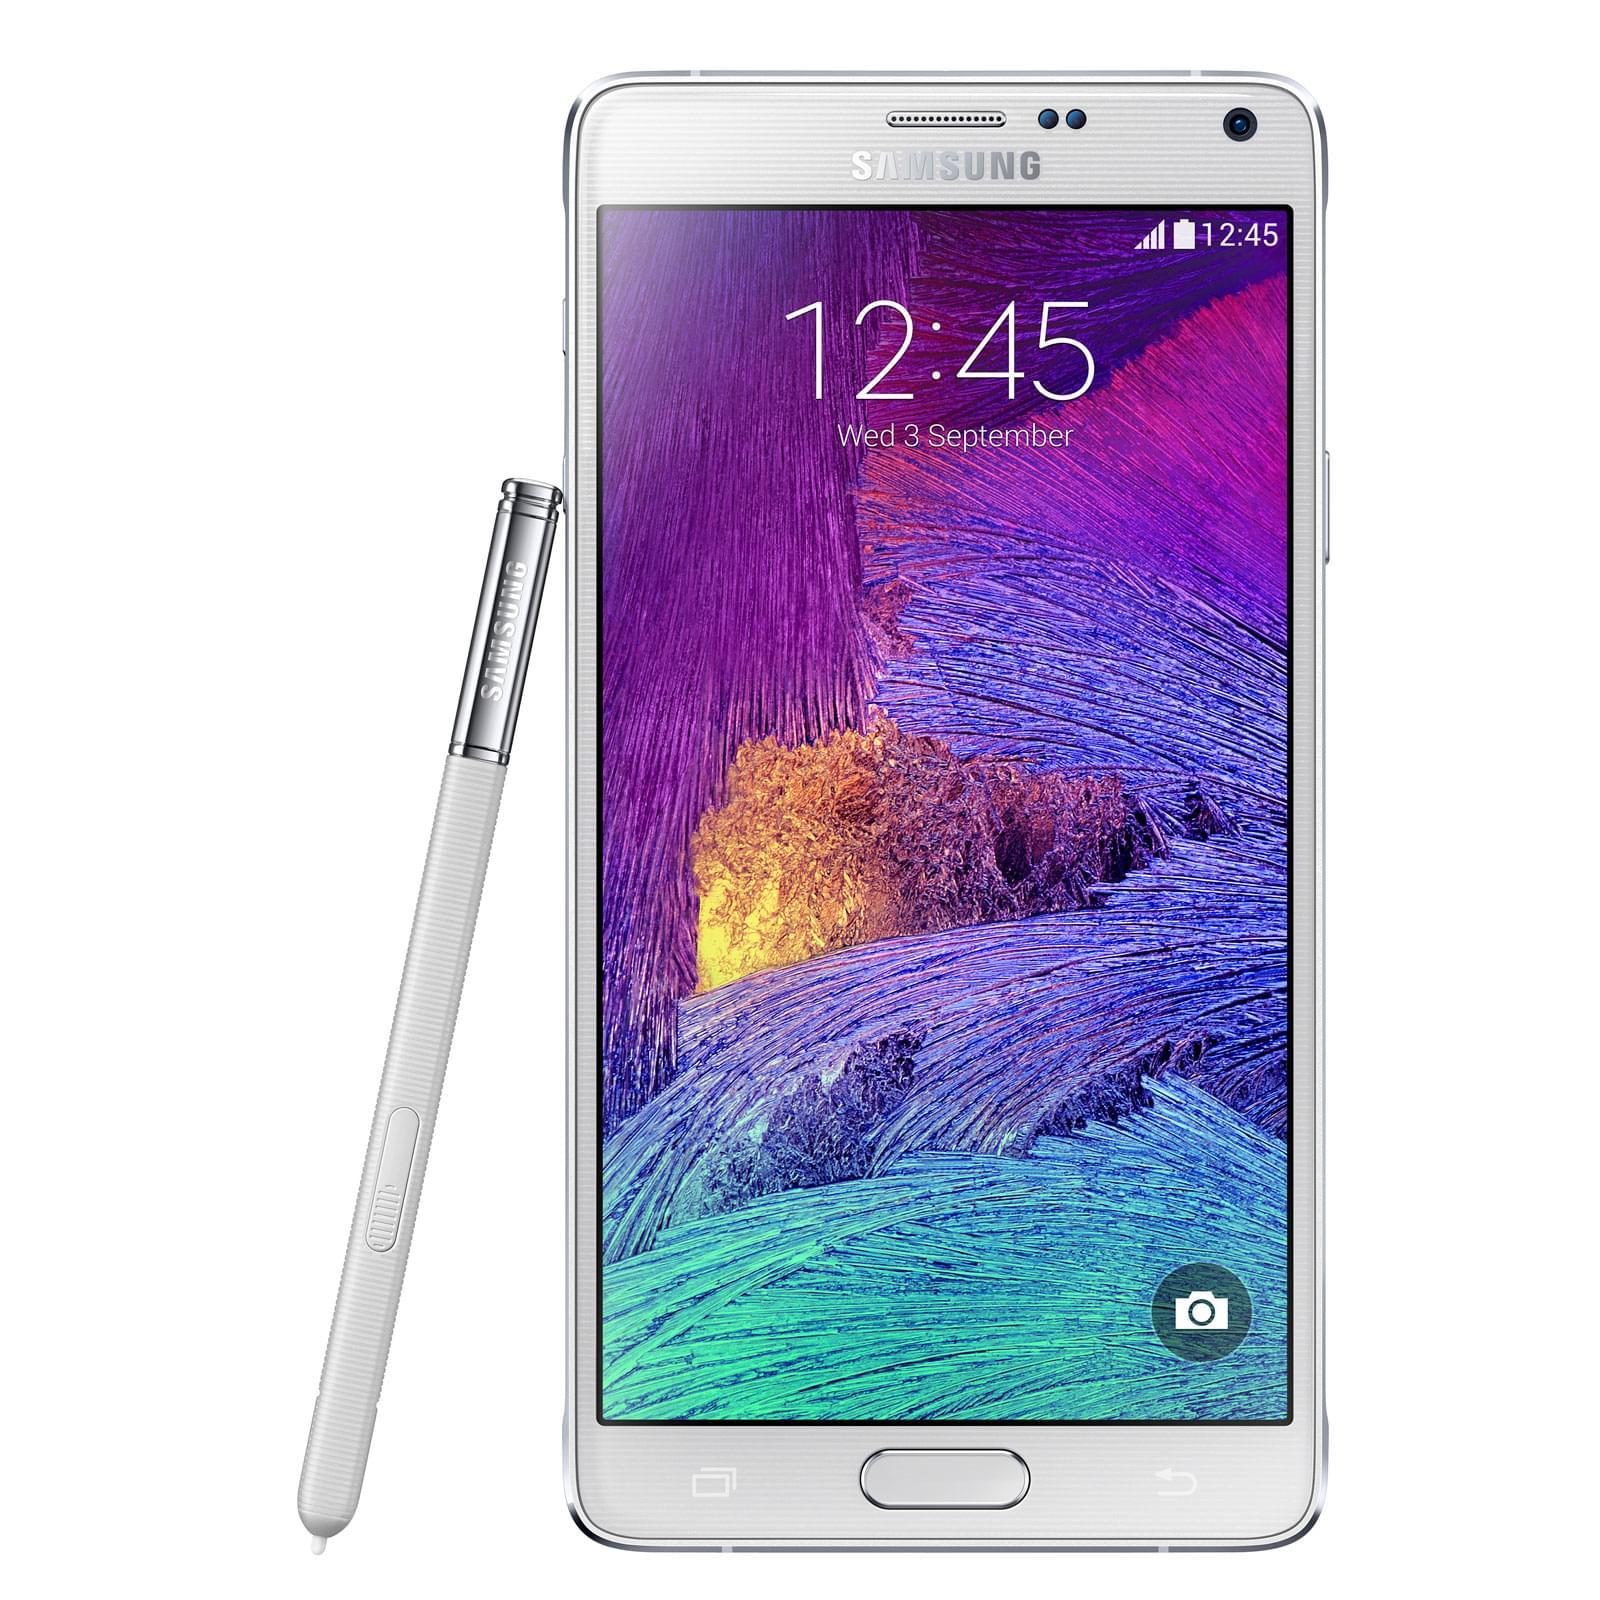 Samsung Galaxy Note 4 32Go N910C White (SM-N910FZWEXEF) - Achat / Vente Téléphonie sur Cybertek.fr - 0